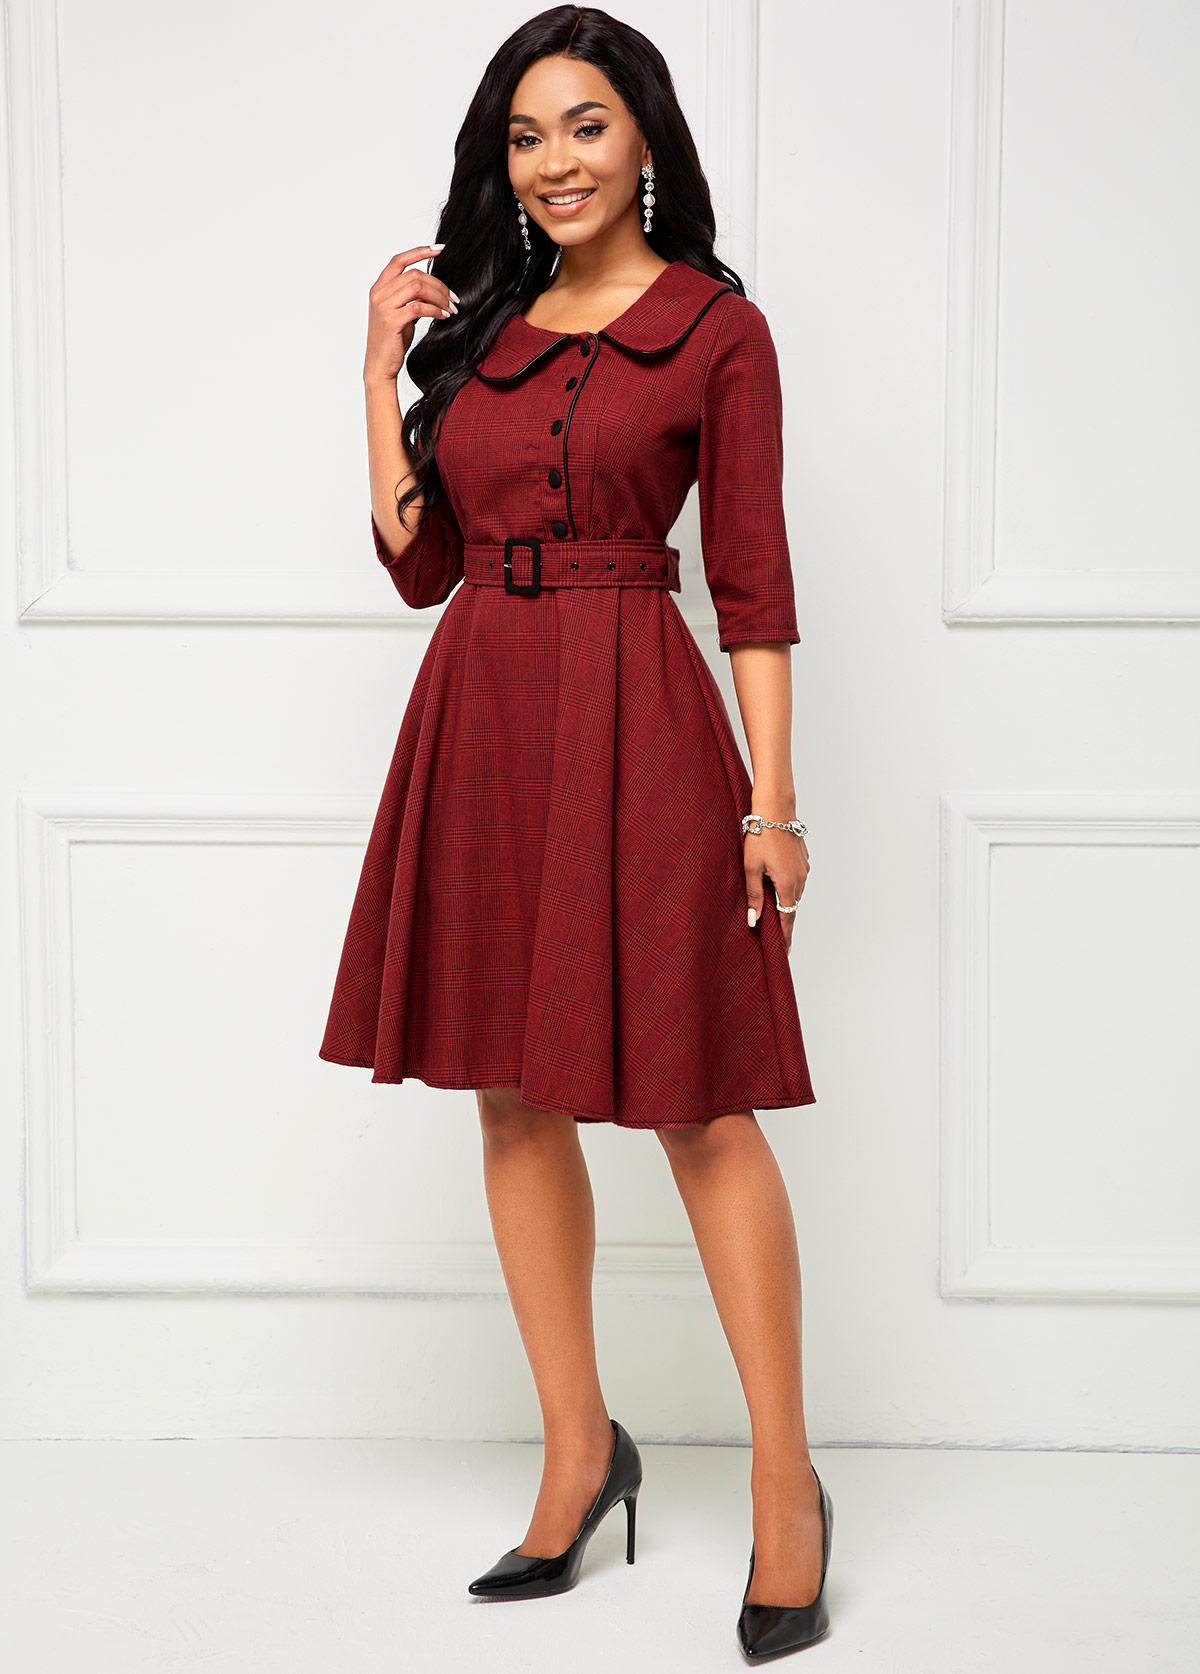 Buckle Belted Turndown Collar Vintage Dress